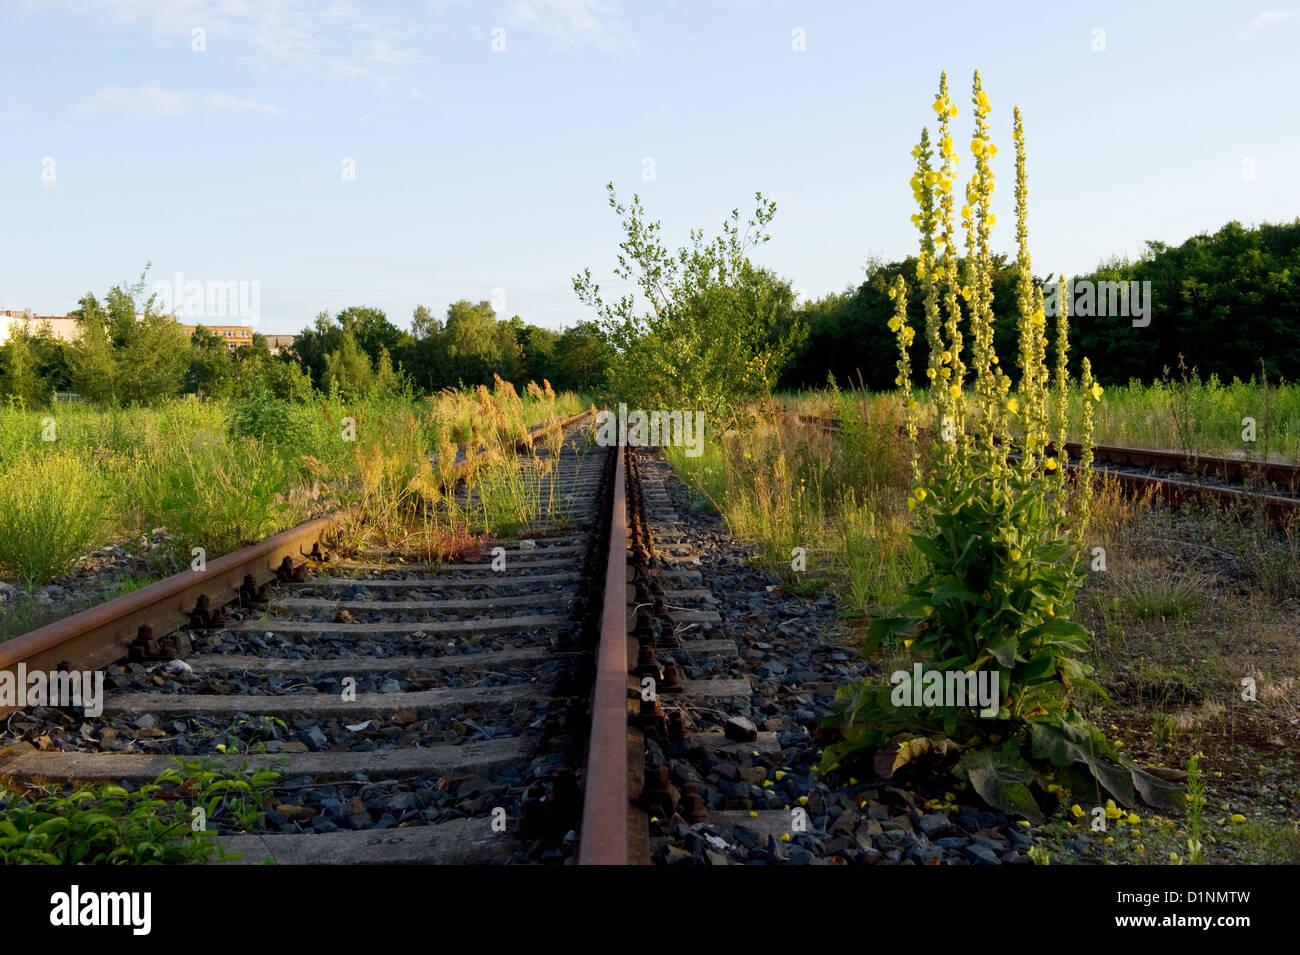 Berlin, Germany, on the tracks Gleisdreiecksgelaende Stock Photo